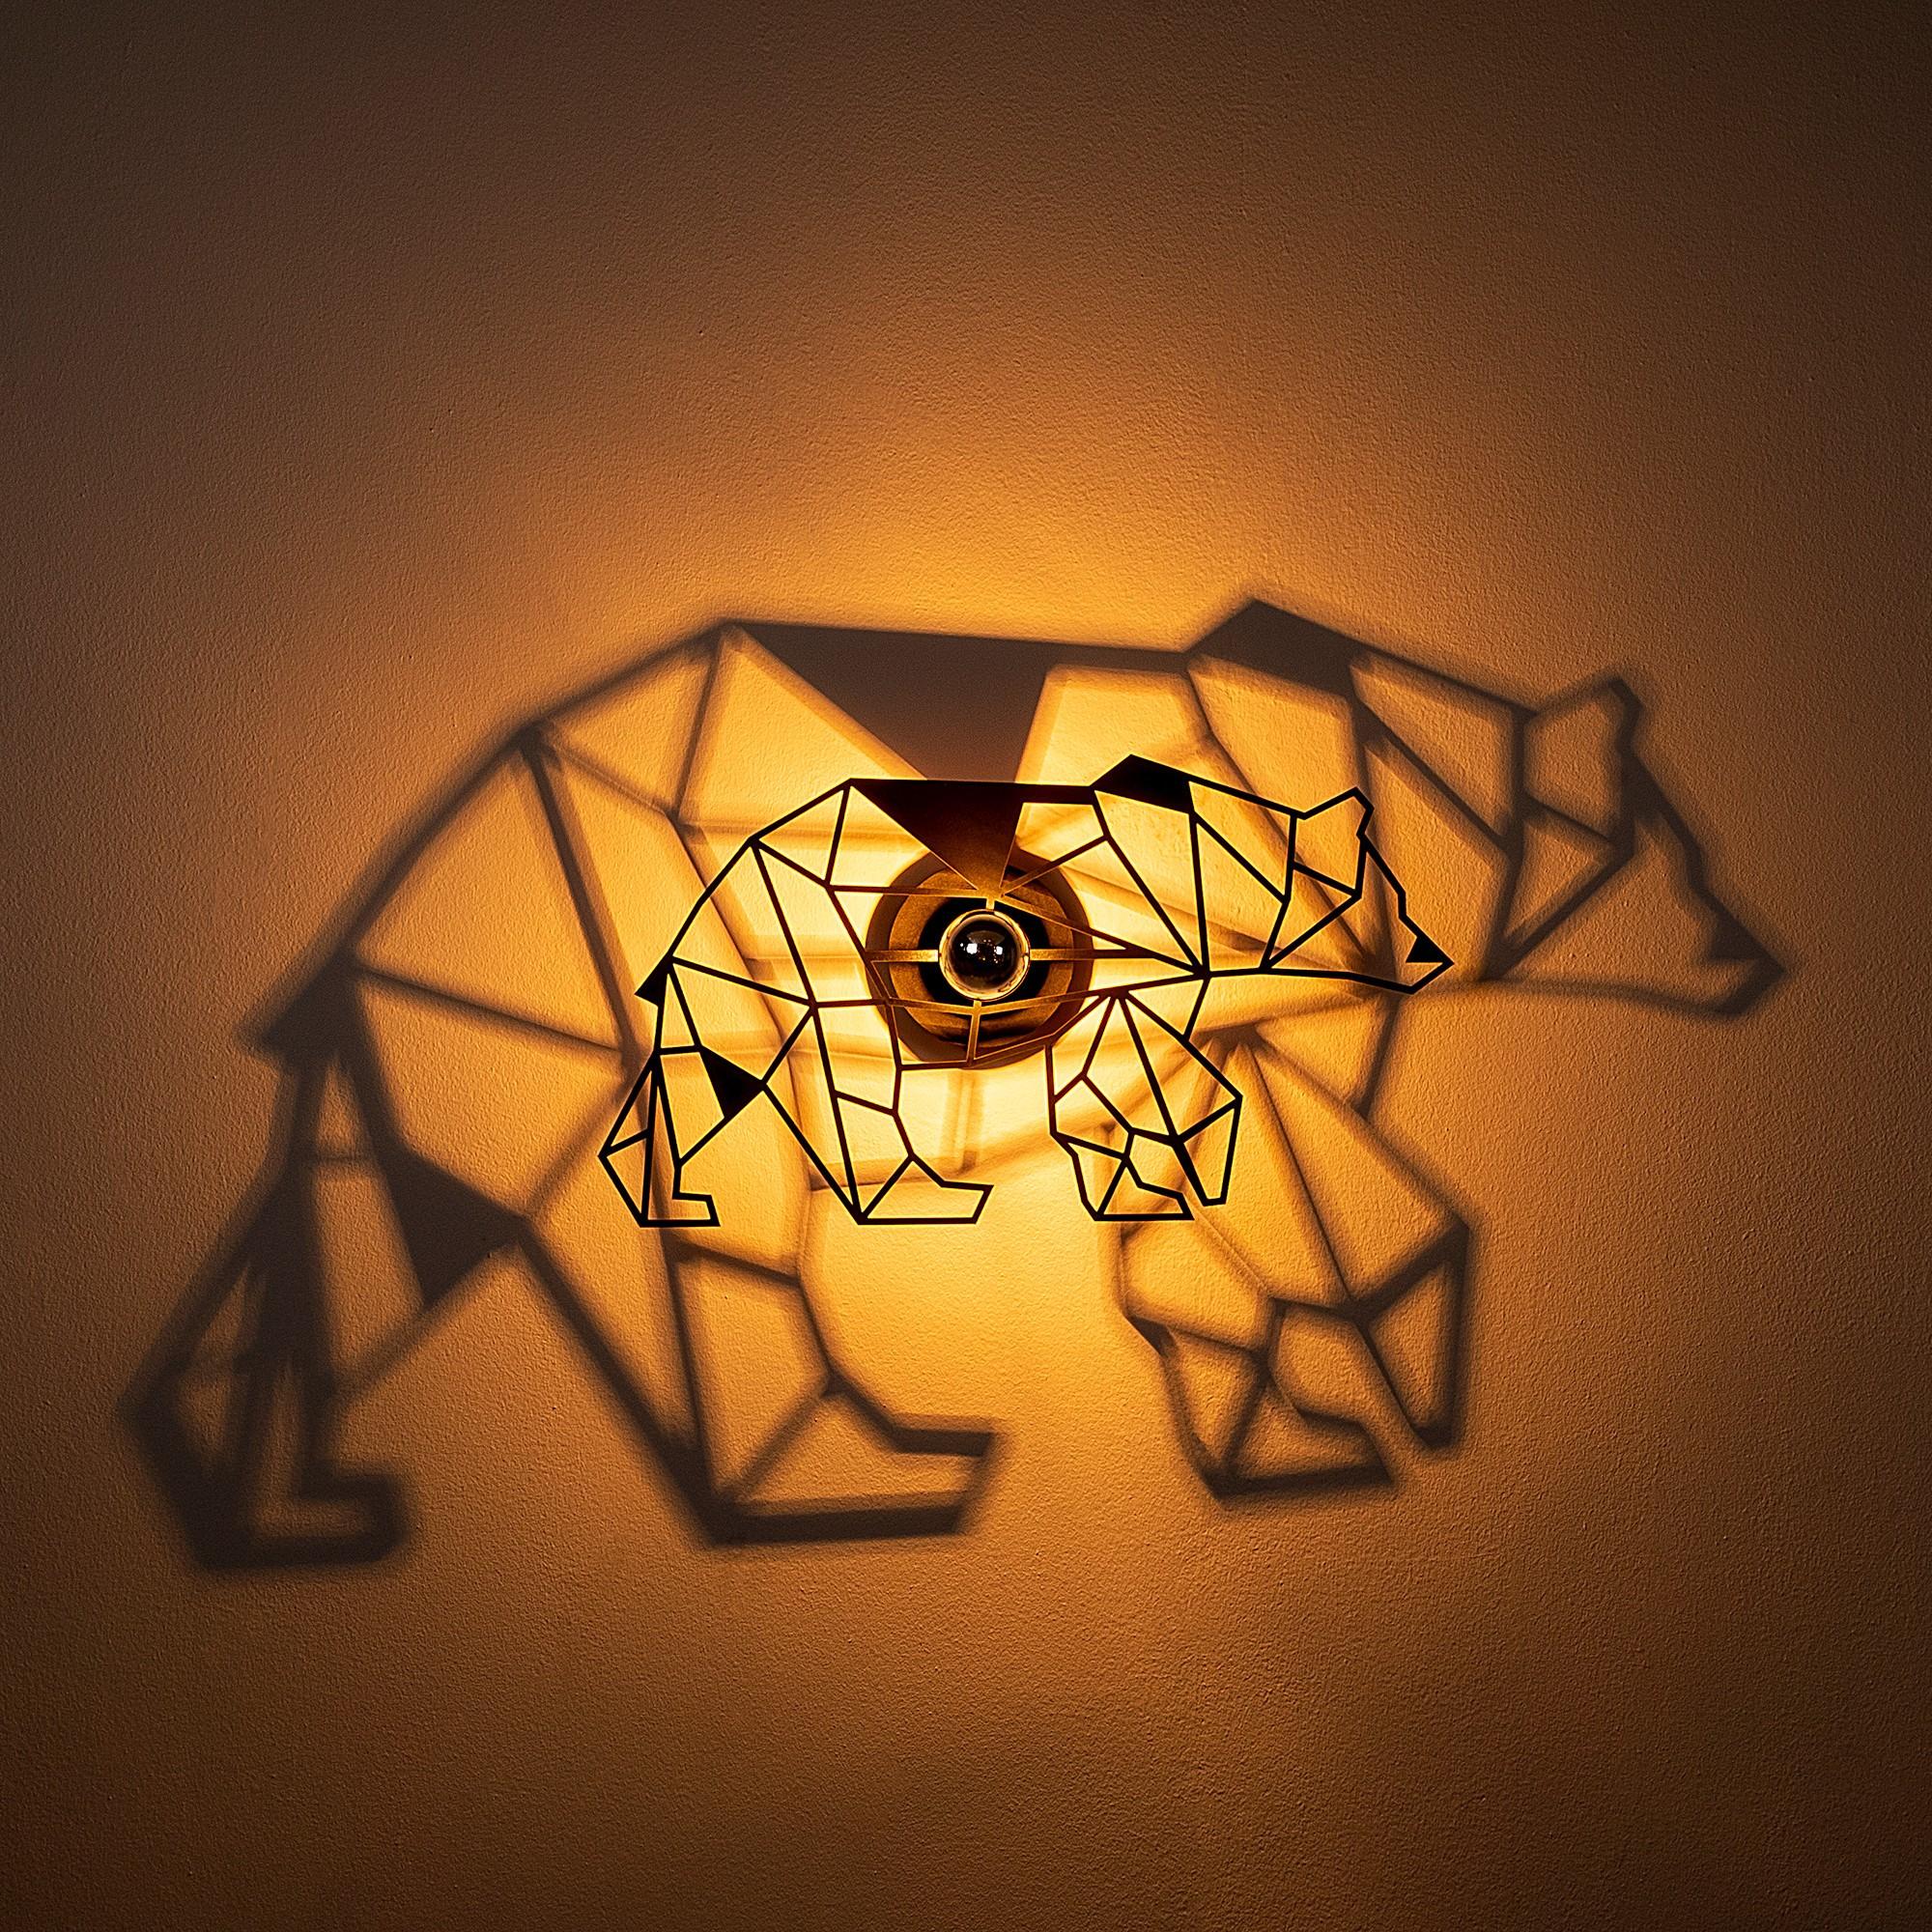 LED industriële wanddeco lamp dieren - bear - dimbaar - E27 fitting - sfeerfoto incl. lamp